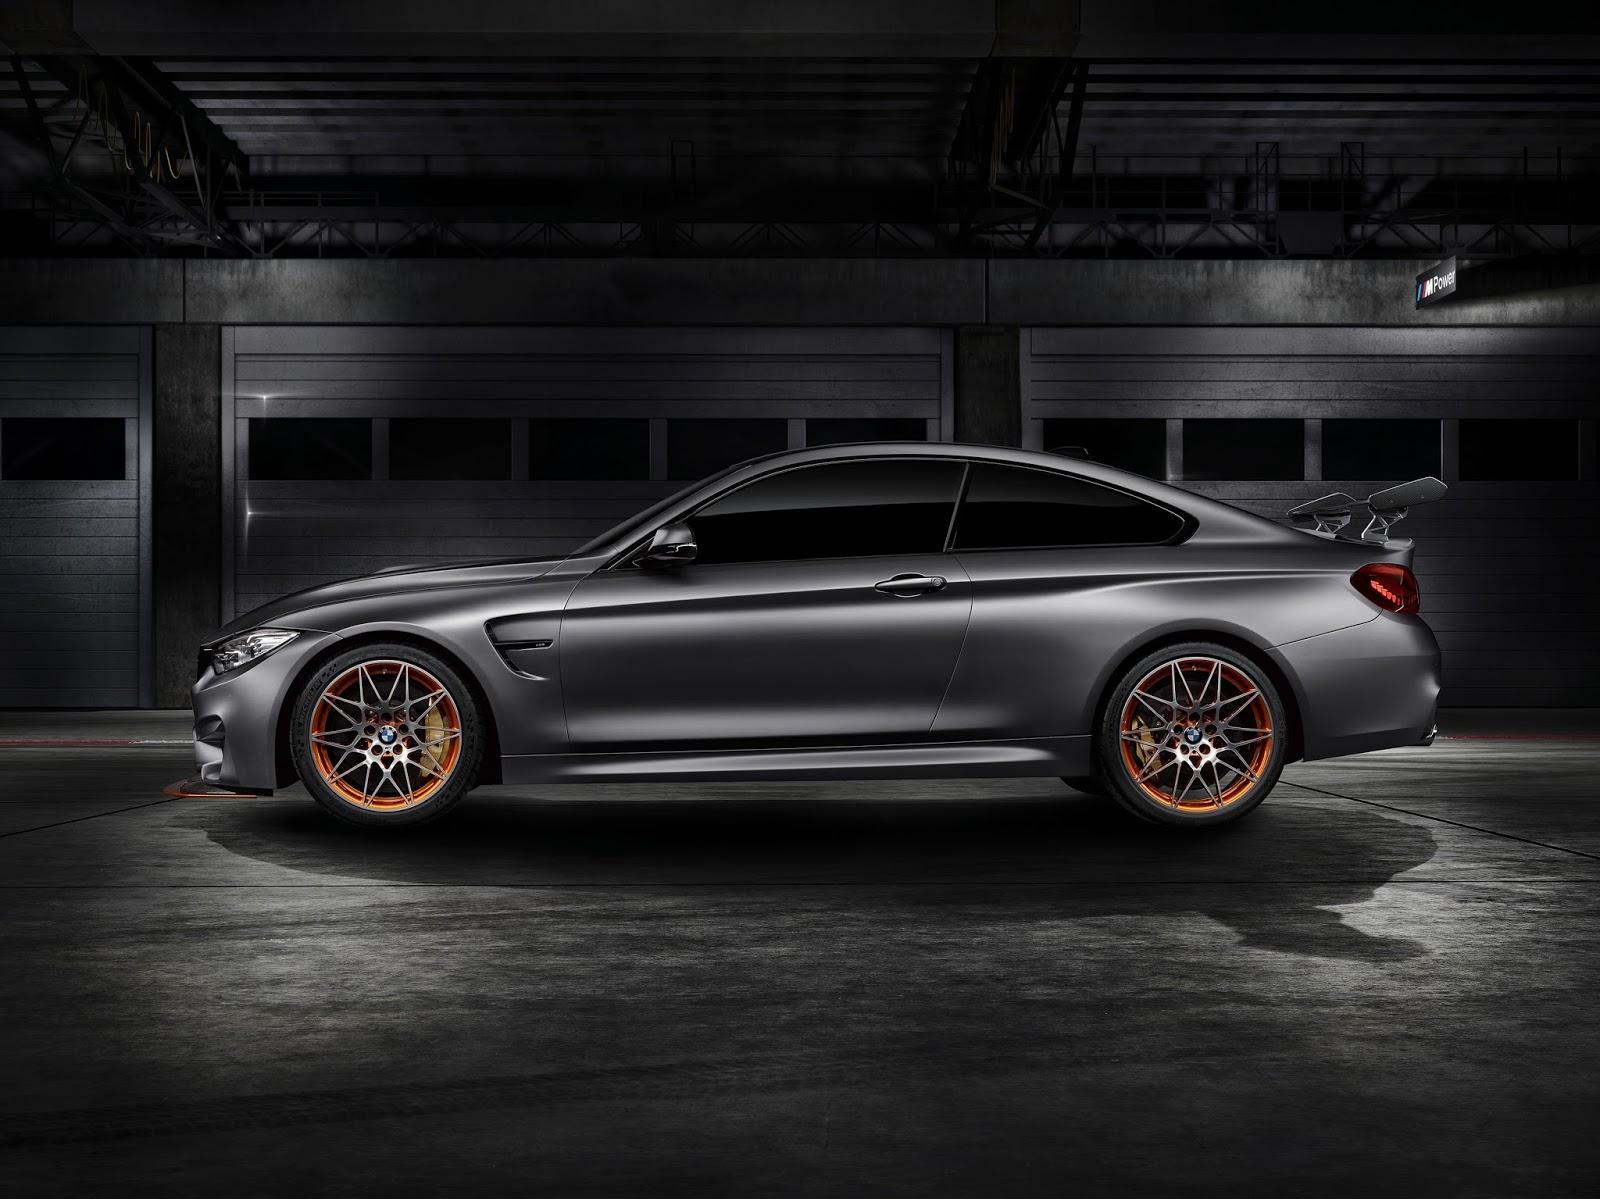 f2 5 Η απάντηση της BMW στη Giulia, λέγεται M4 GTS Alfa Romeo Giulia, BMW, BMW M4 GTS, Nurburgring, zblog